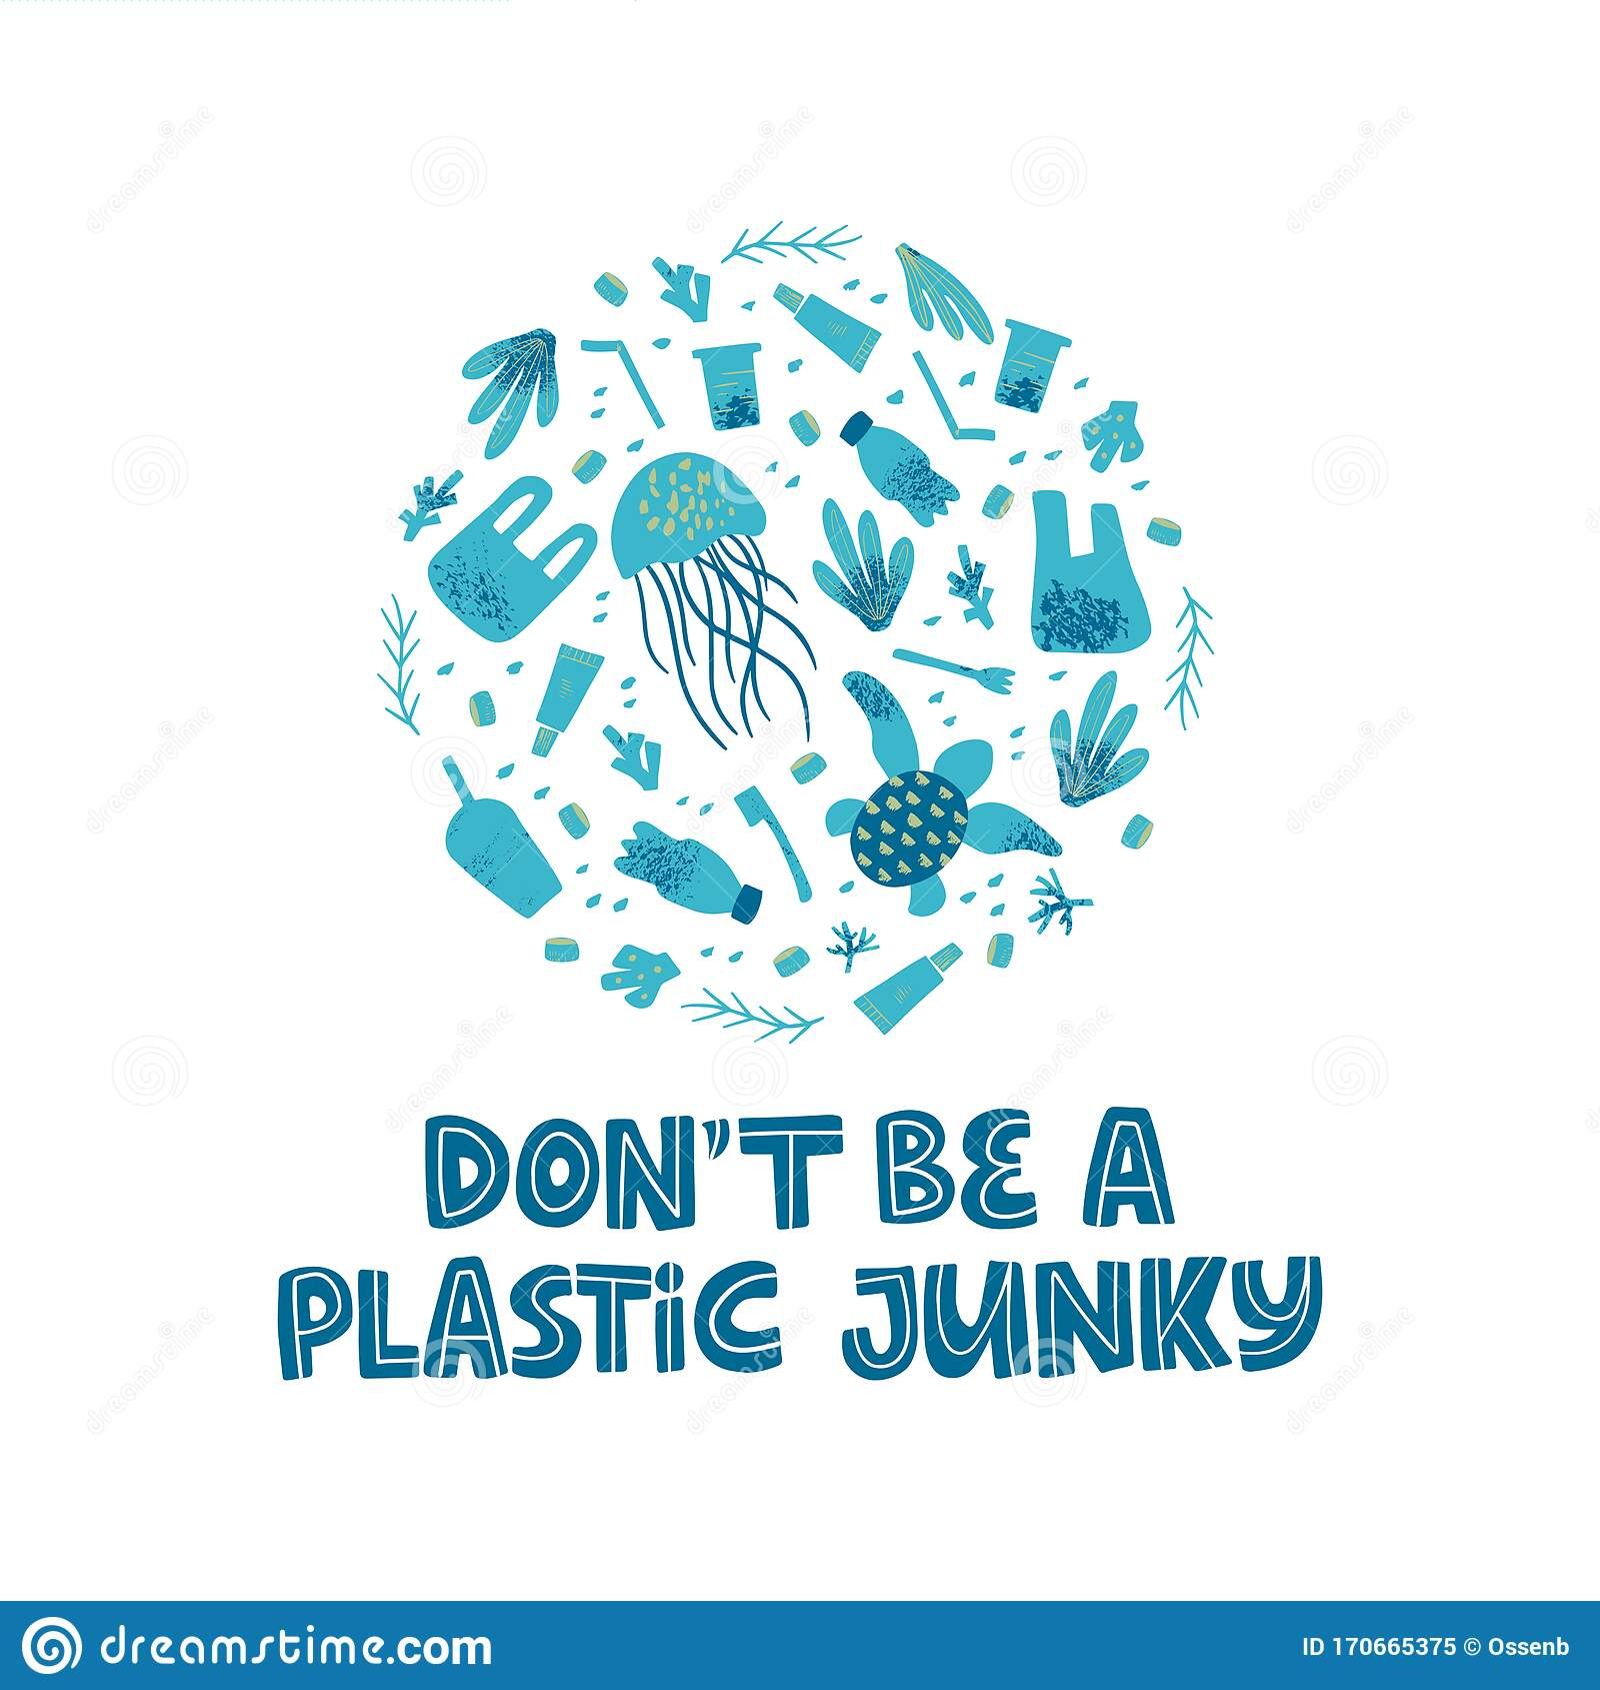 https www dreamstime com zero waste plastic free slogan stop pollution campaign contamination water poster design template disposable garbage sea ocean image170665375